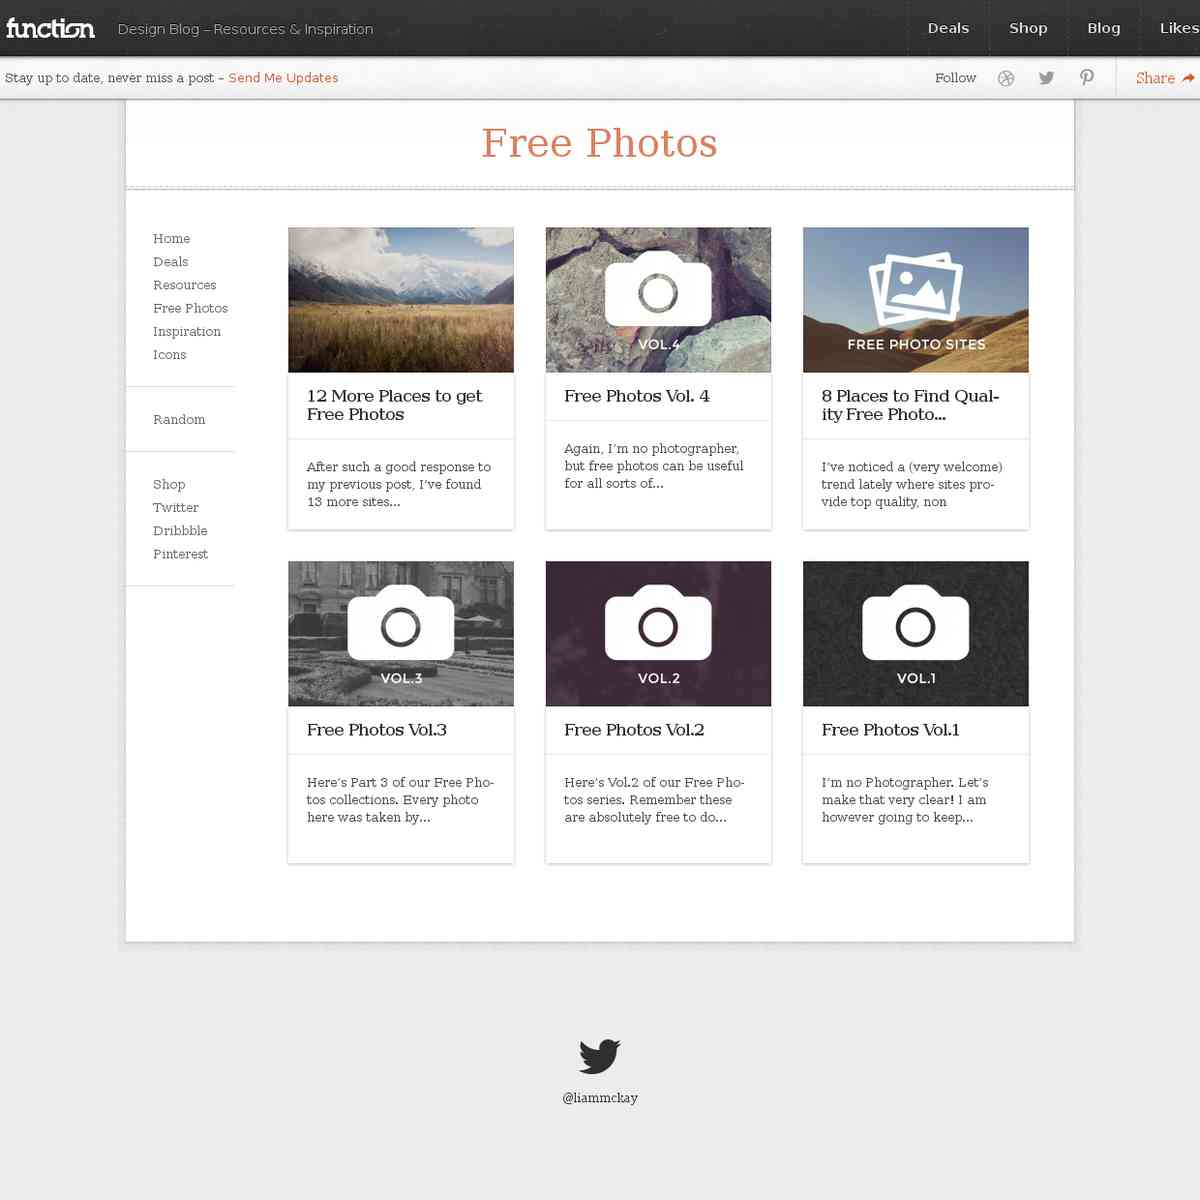 Free Photos – Function Design Blog